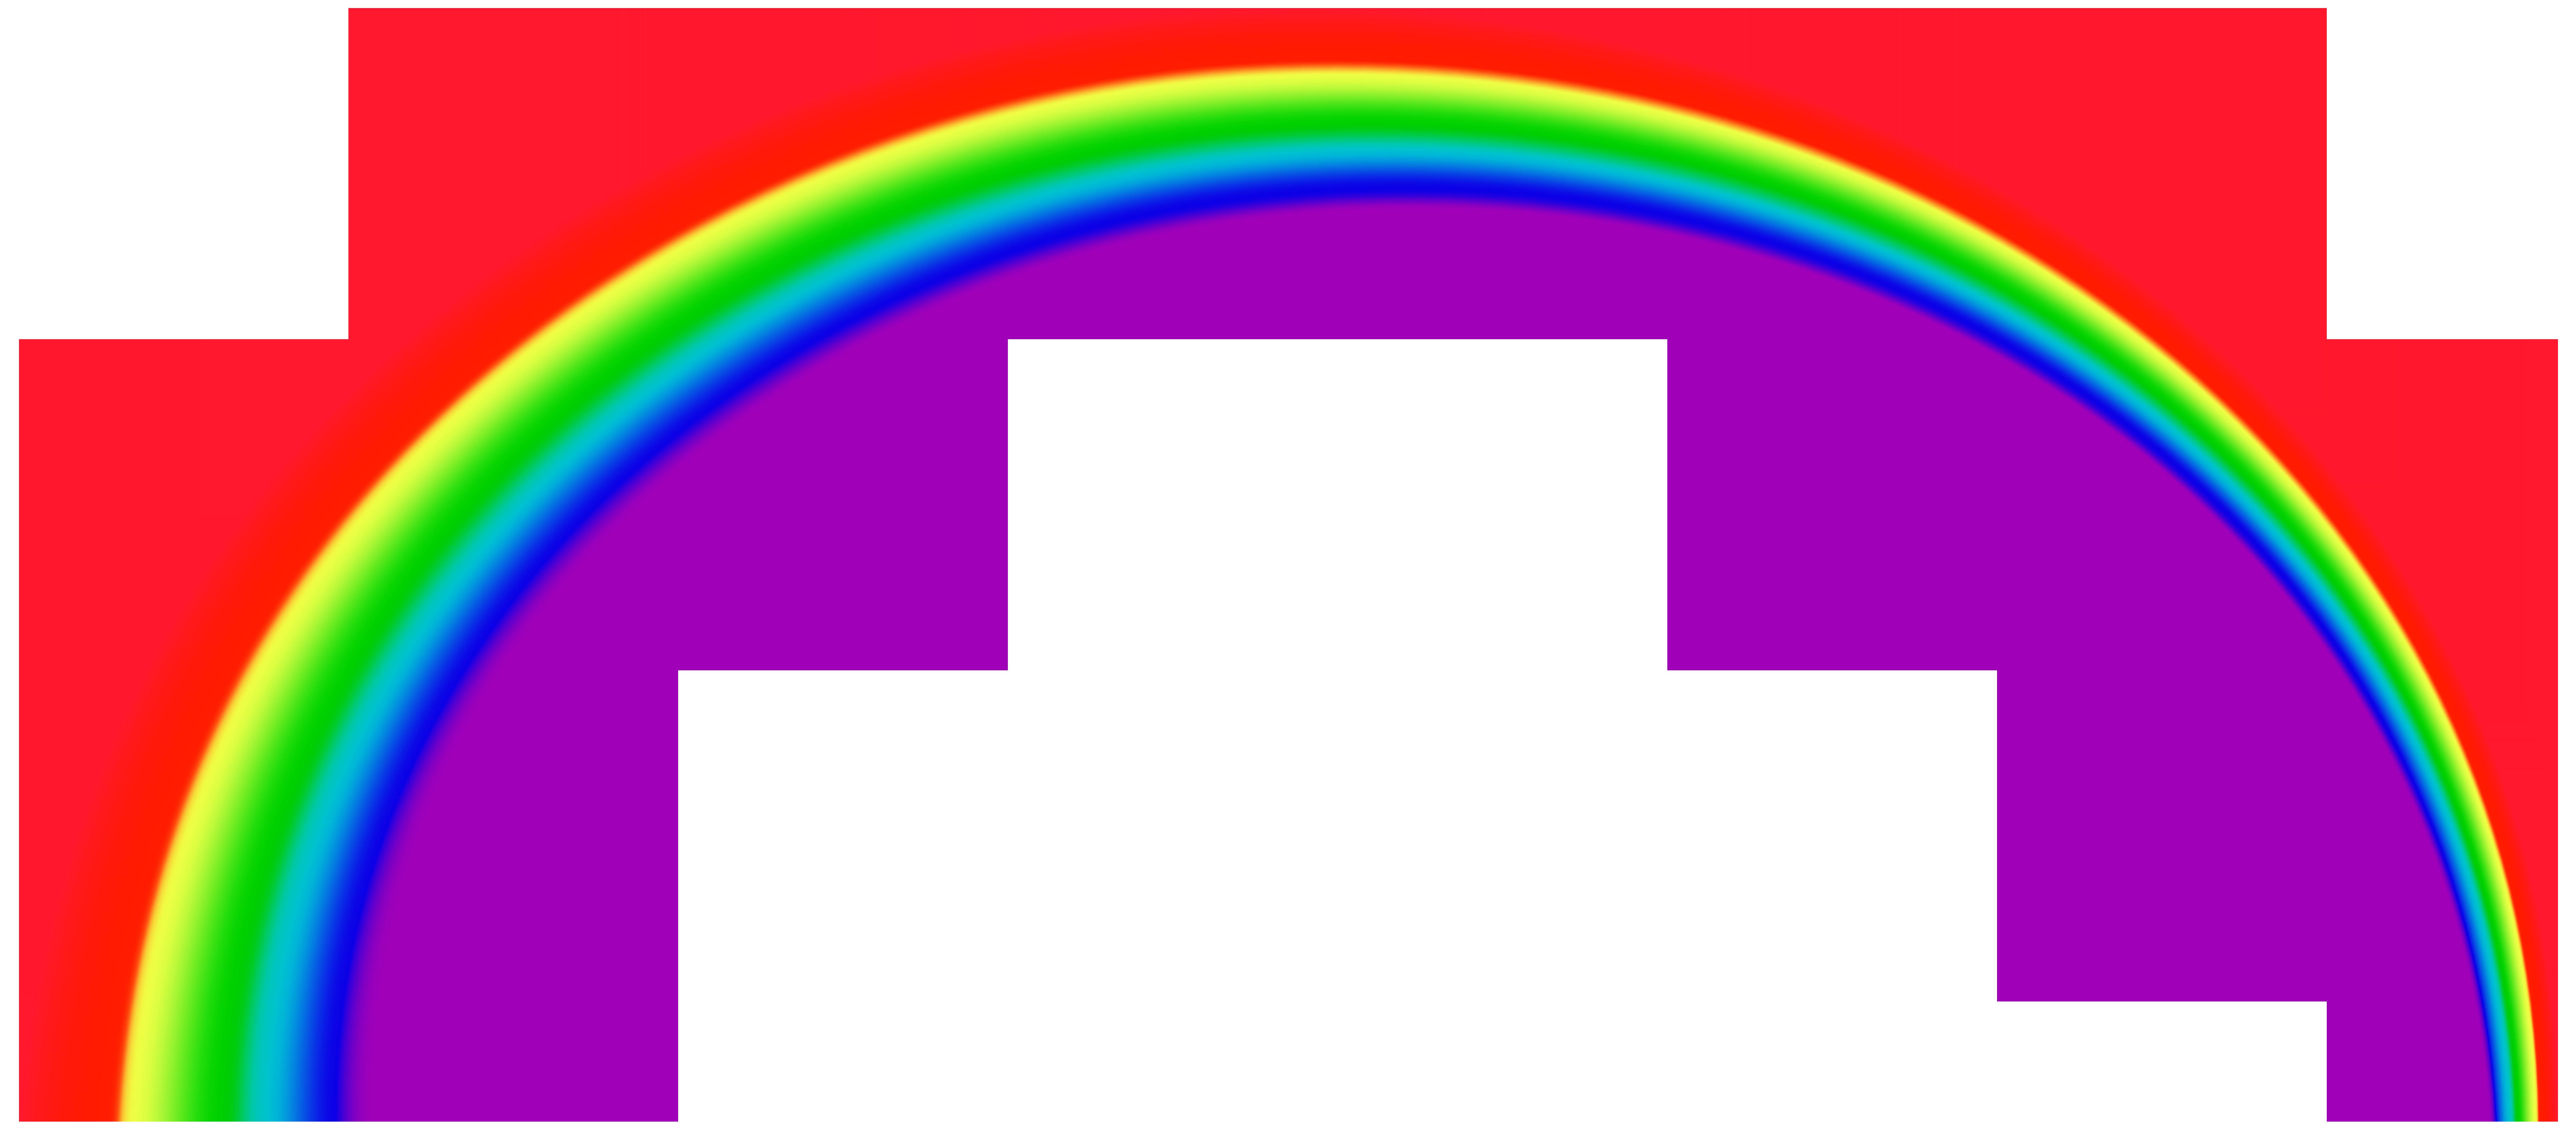 Download free clipart images jpg transparent Rainbow Clipart Free Download | Free download best Rainbow Clipart ... jpg transparent